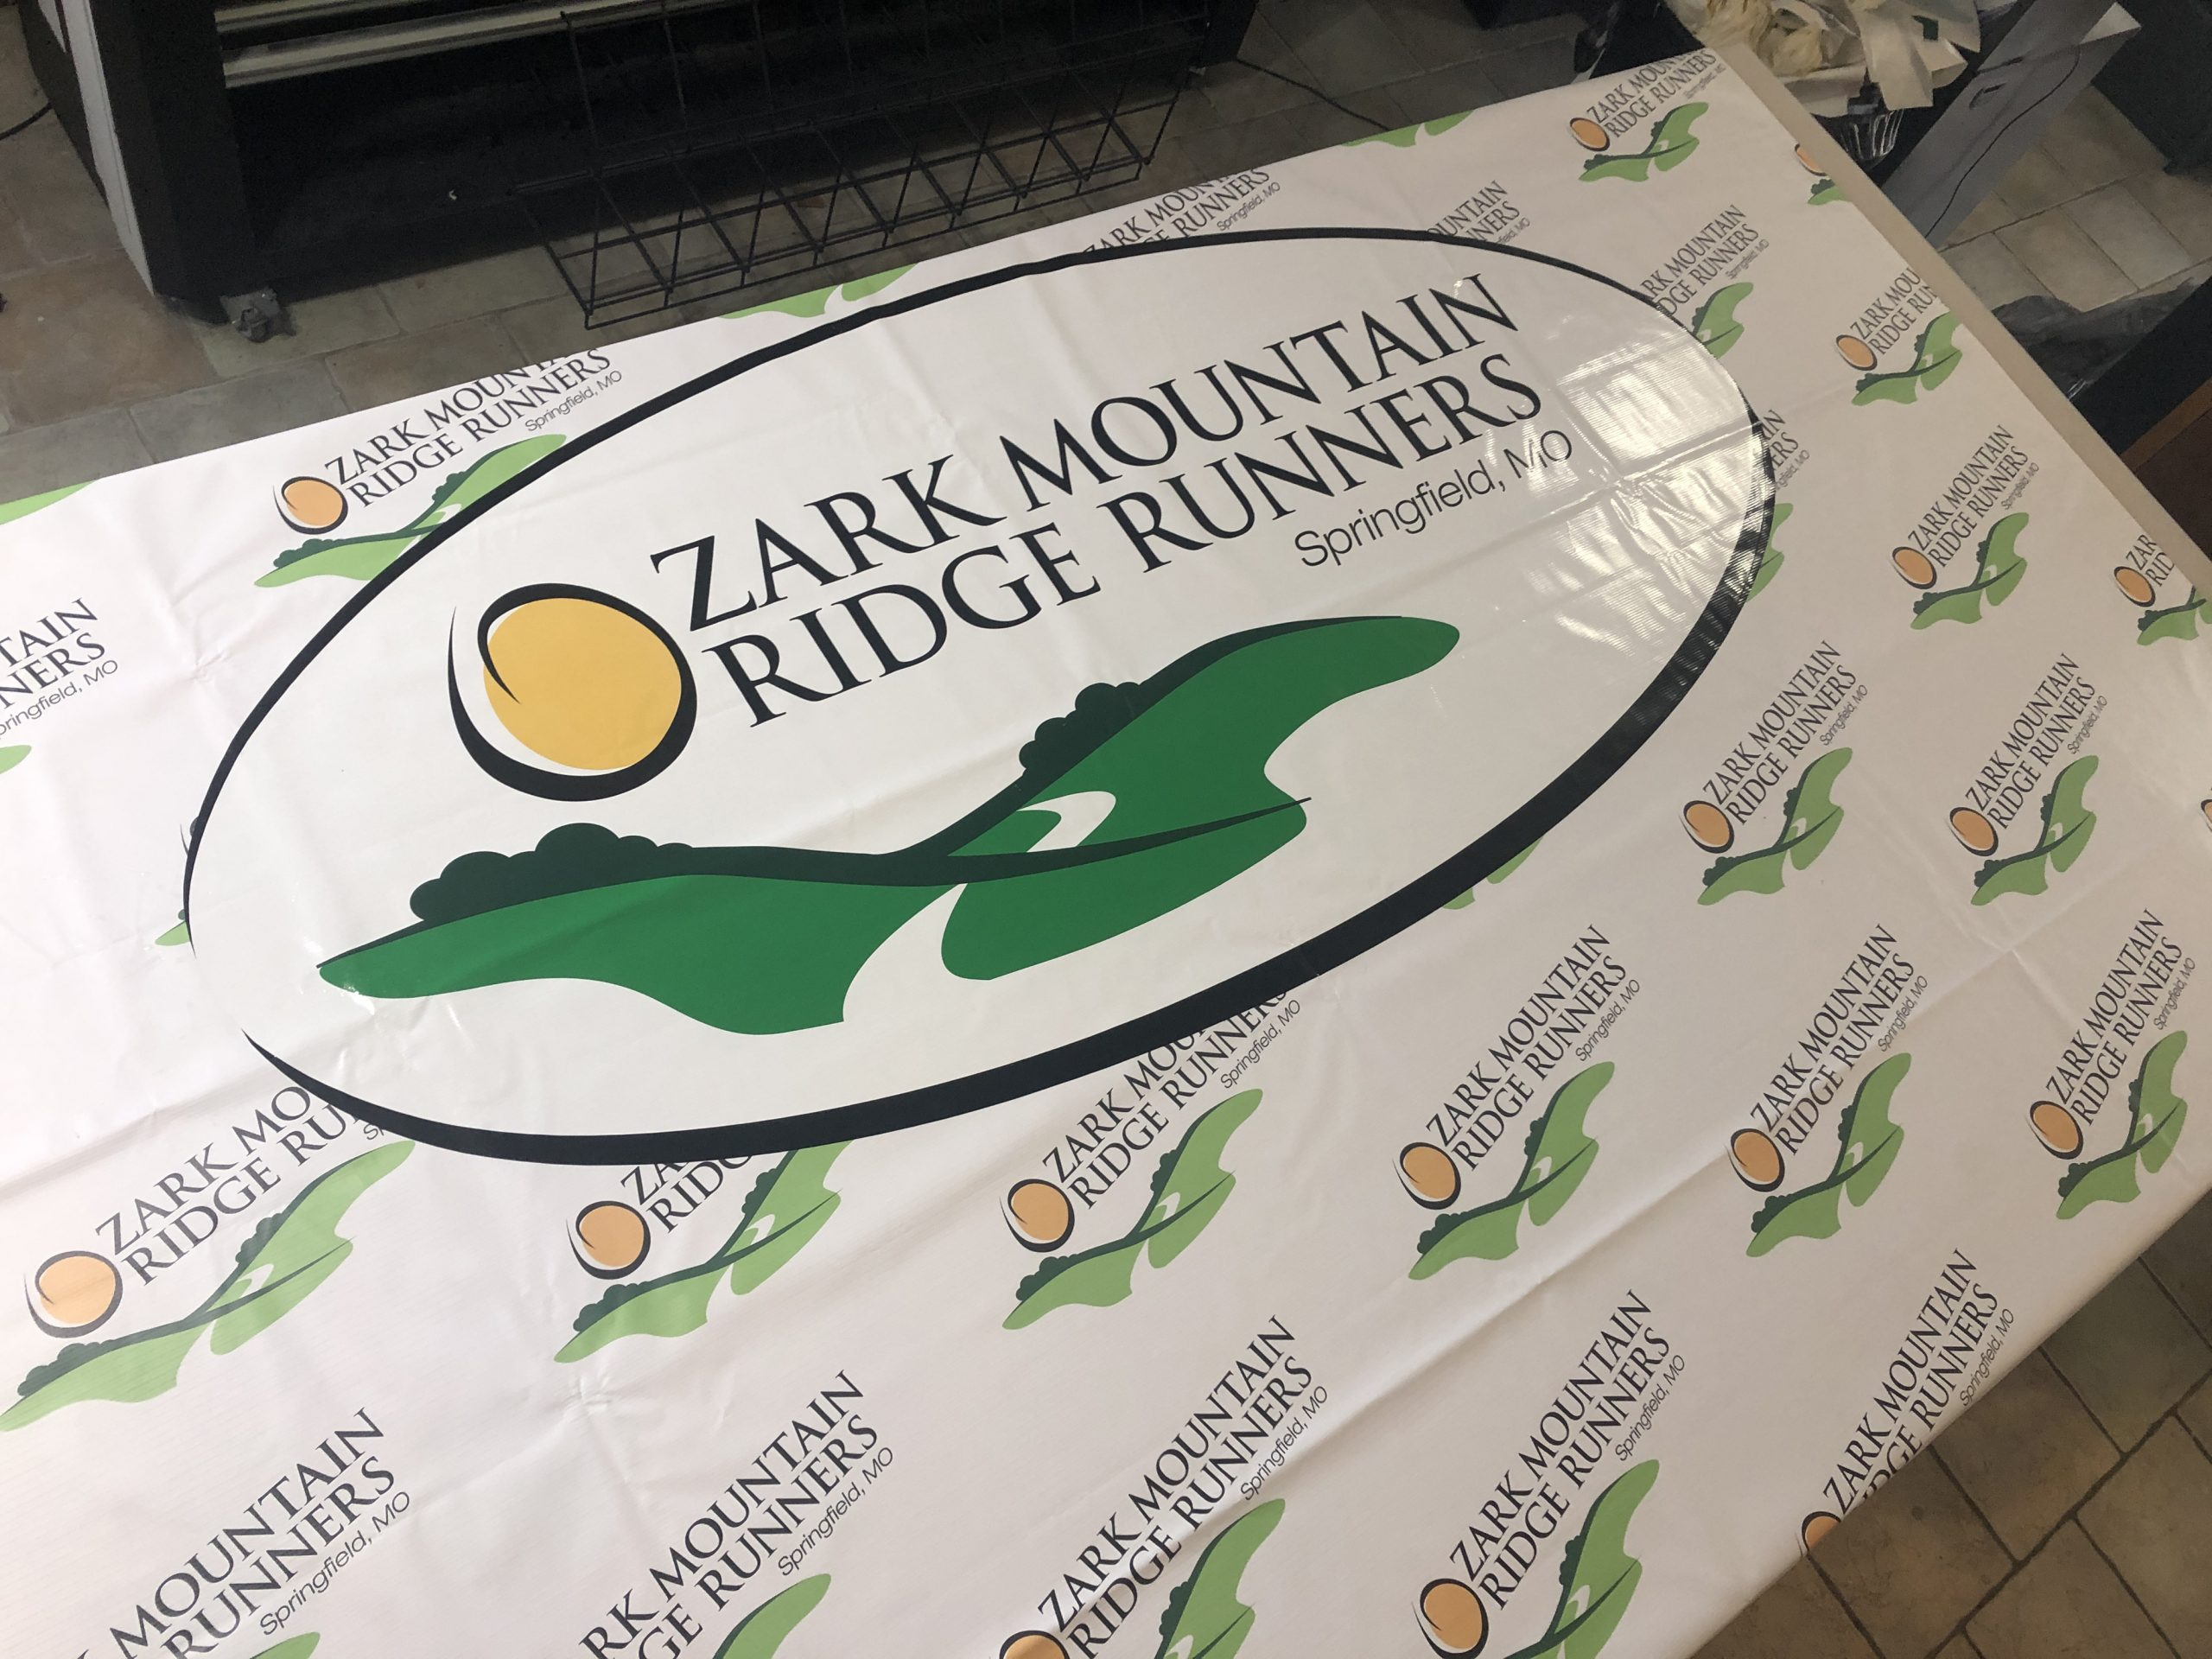 Ozark Mountain Ridge Runners